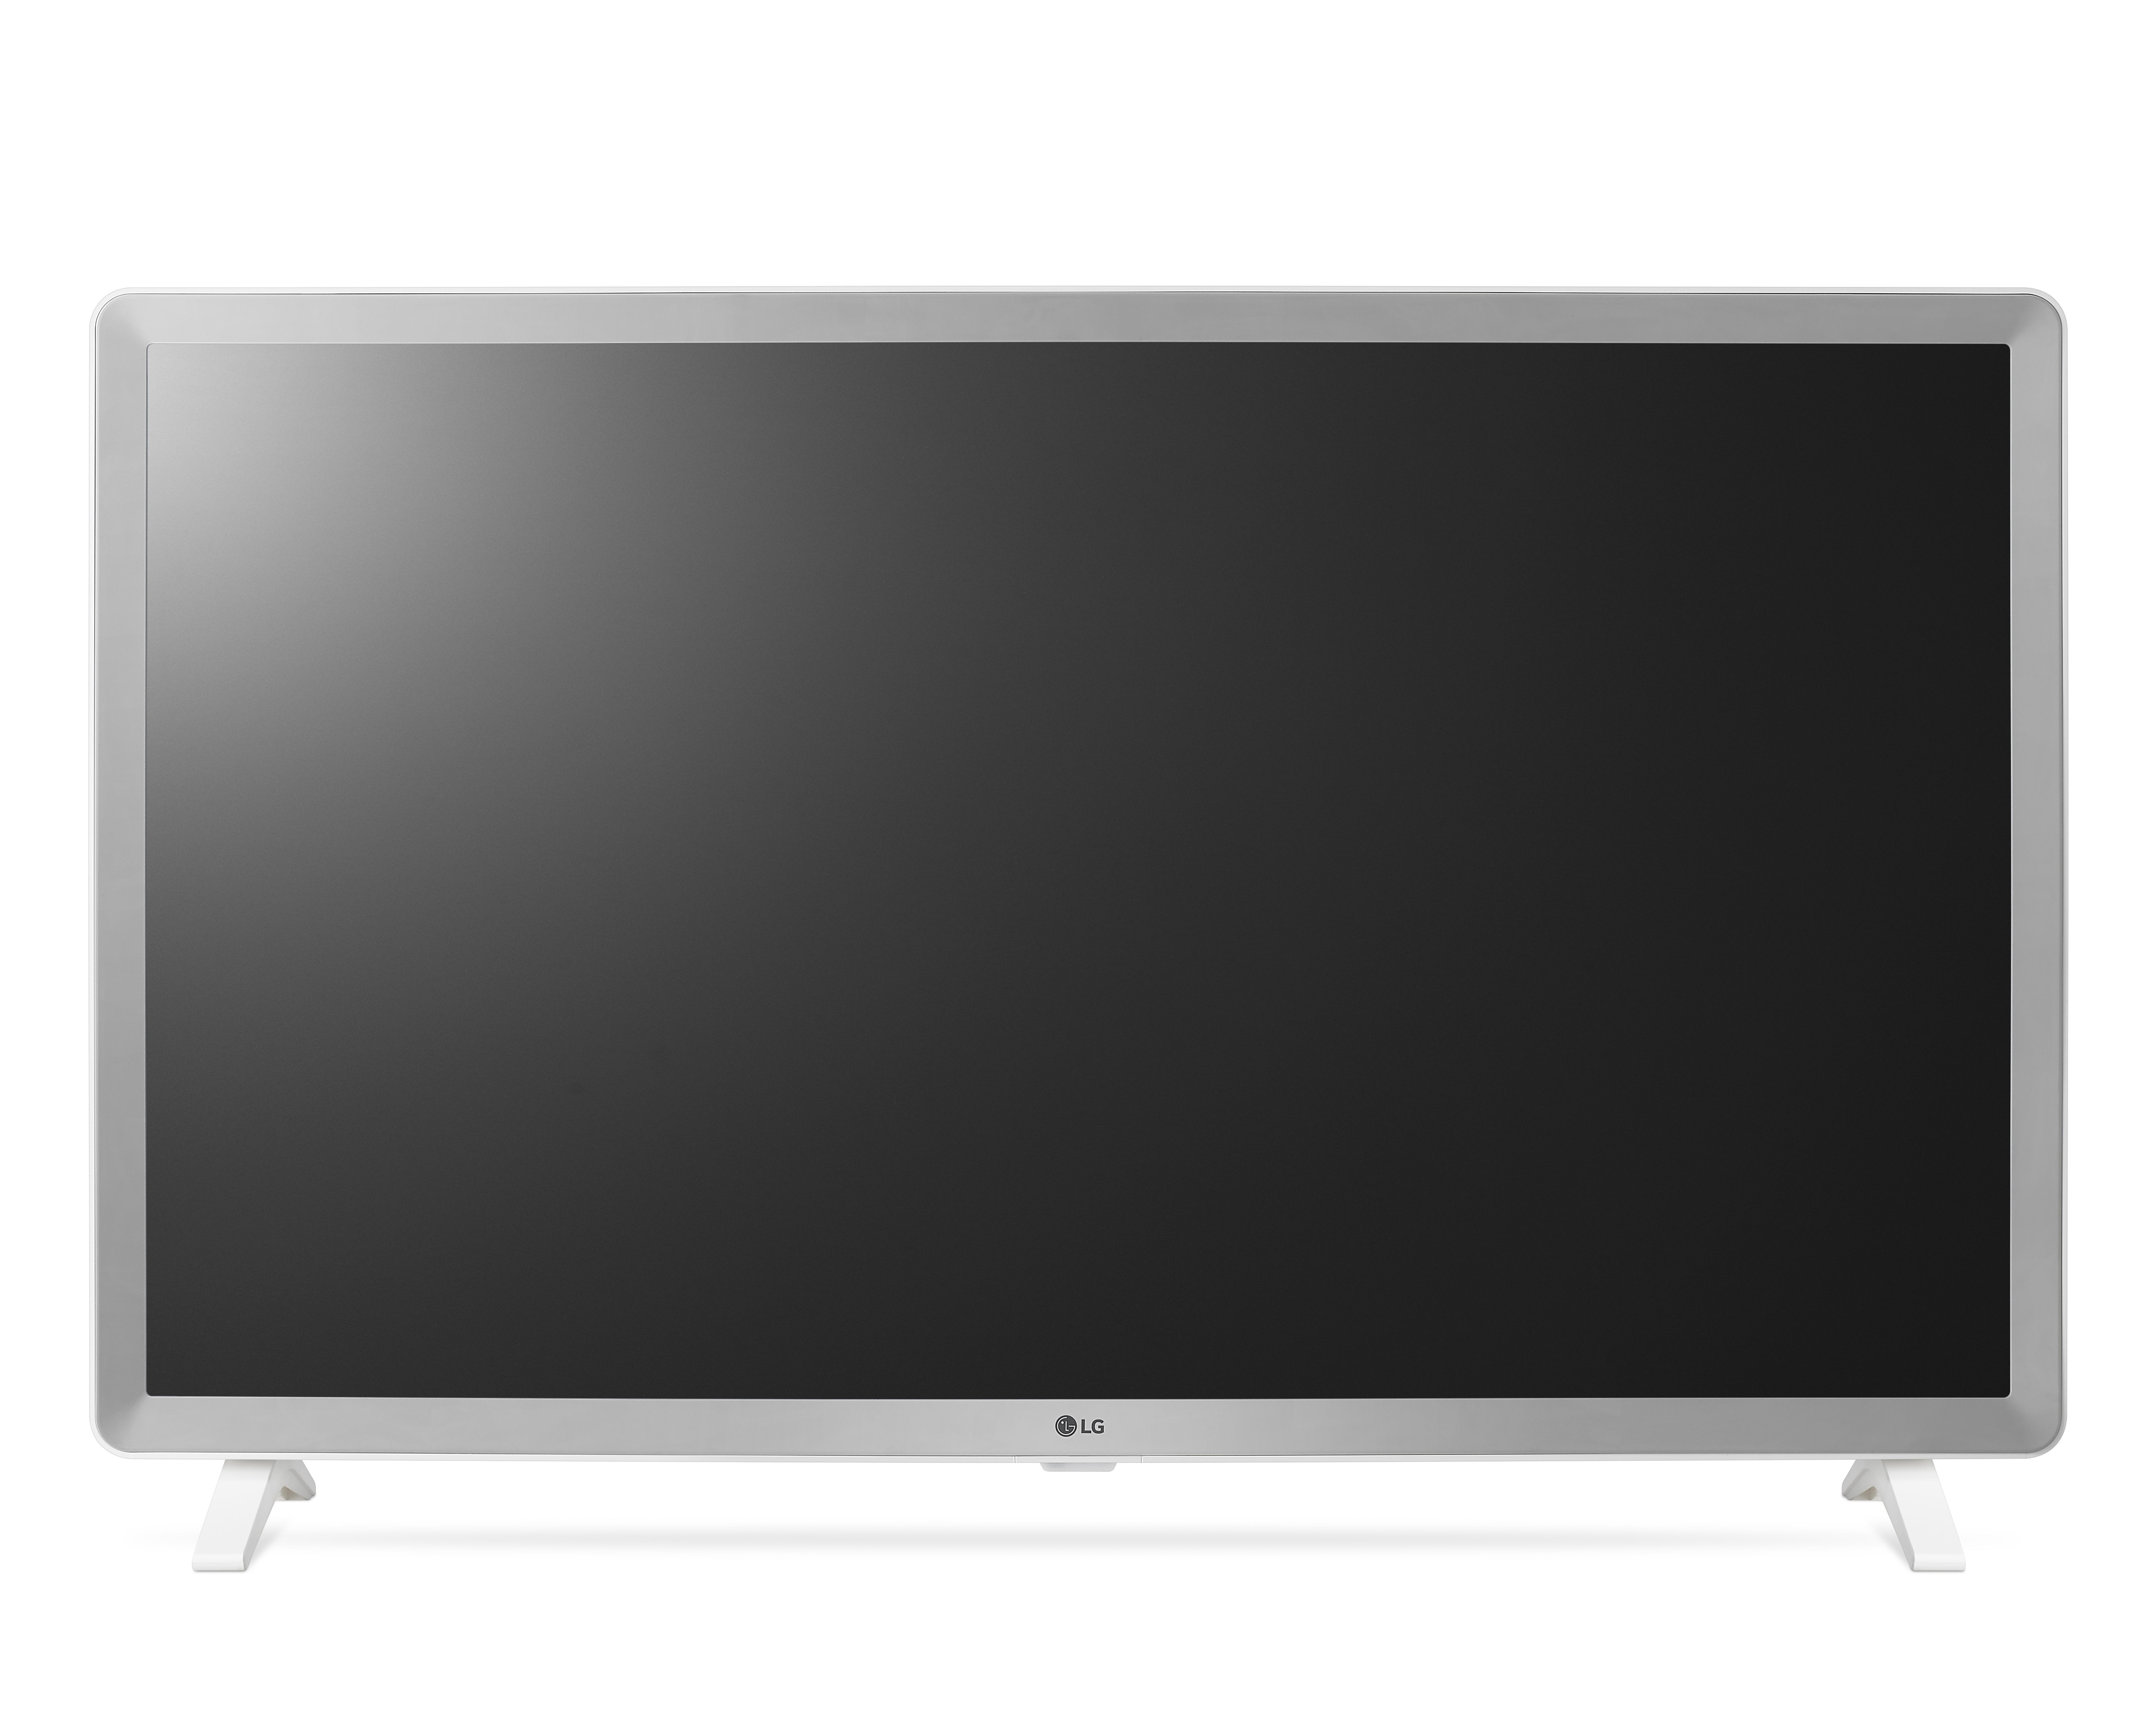 LG LCD 32LK6200 WHITE FHD  SMART